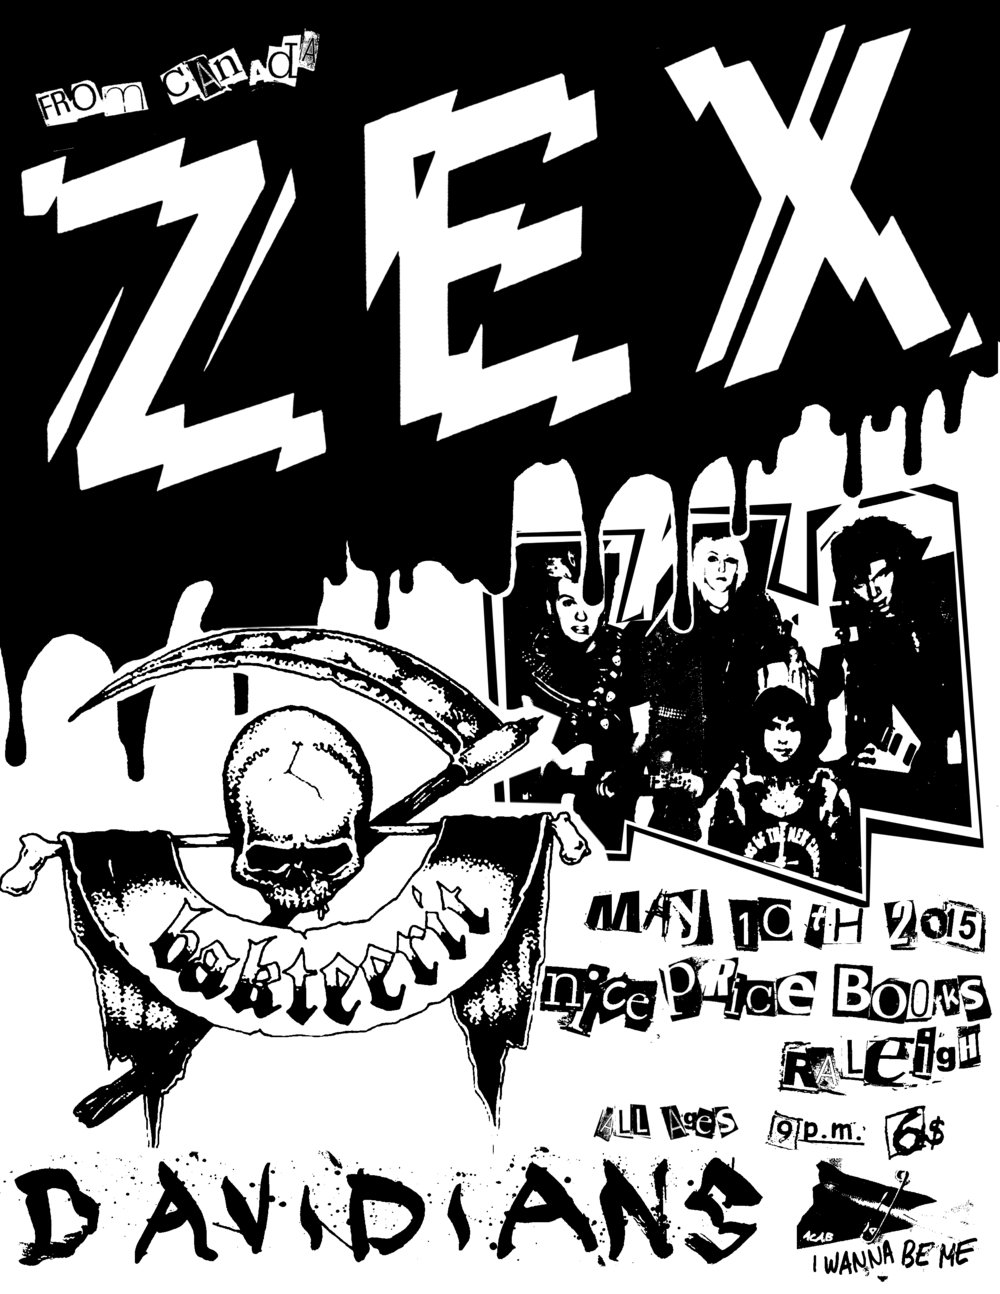 flyer-15.05.10-raleigh-zex.jpg